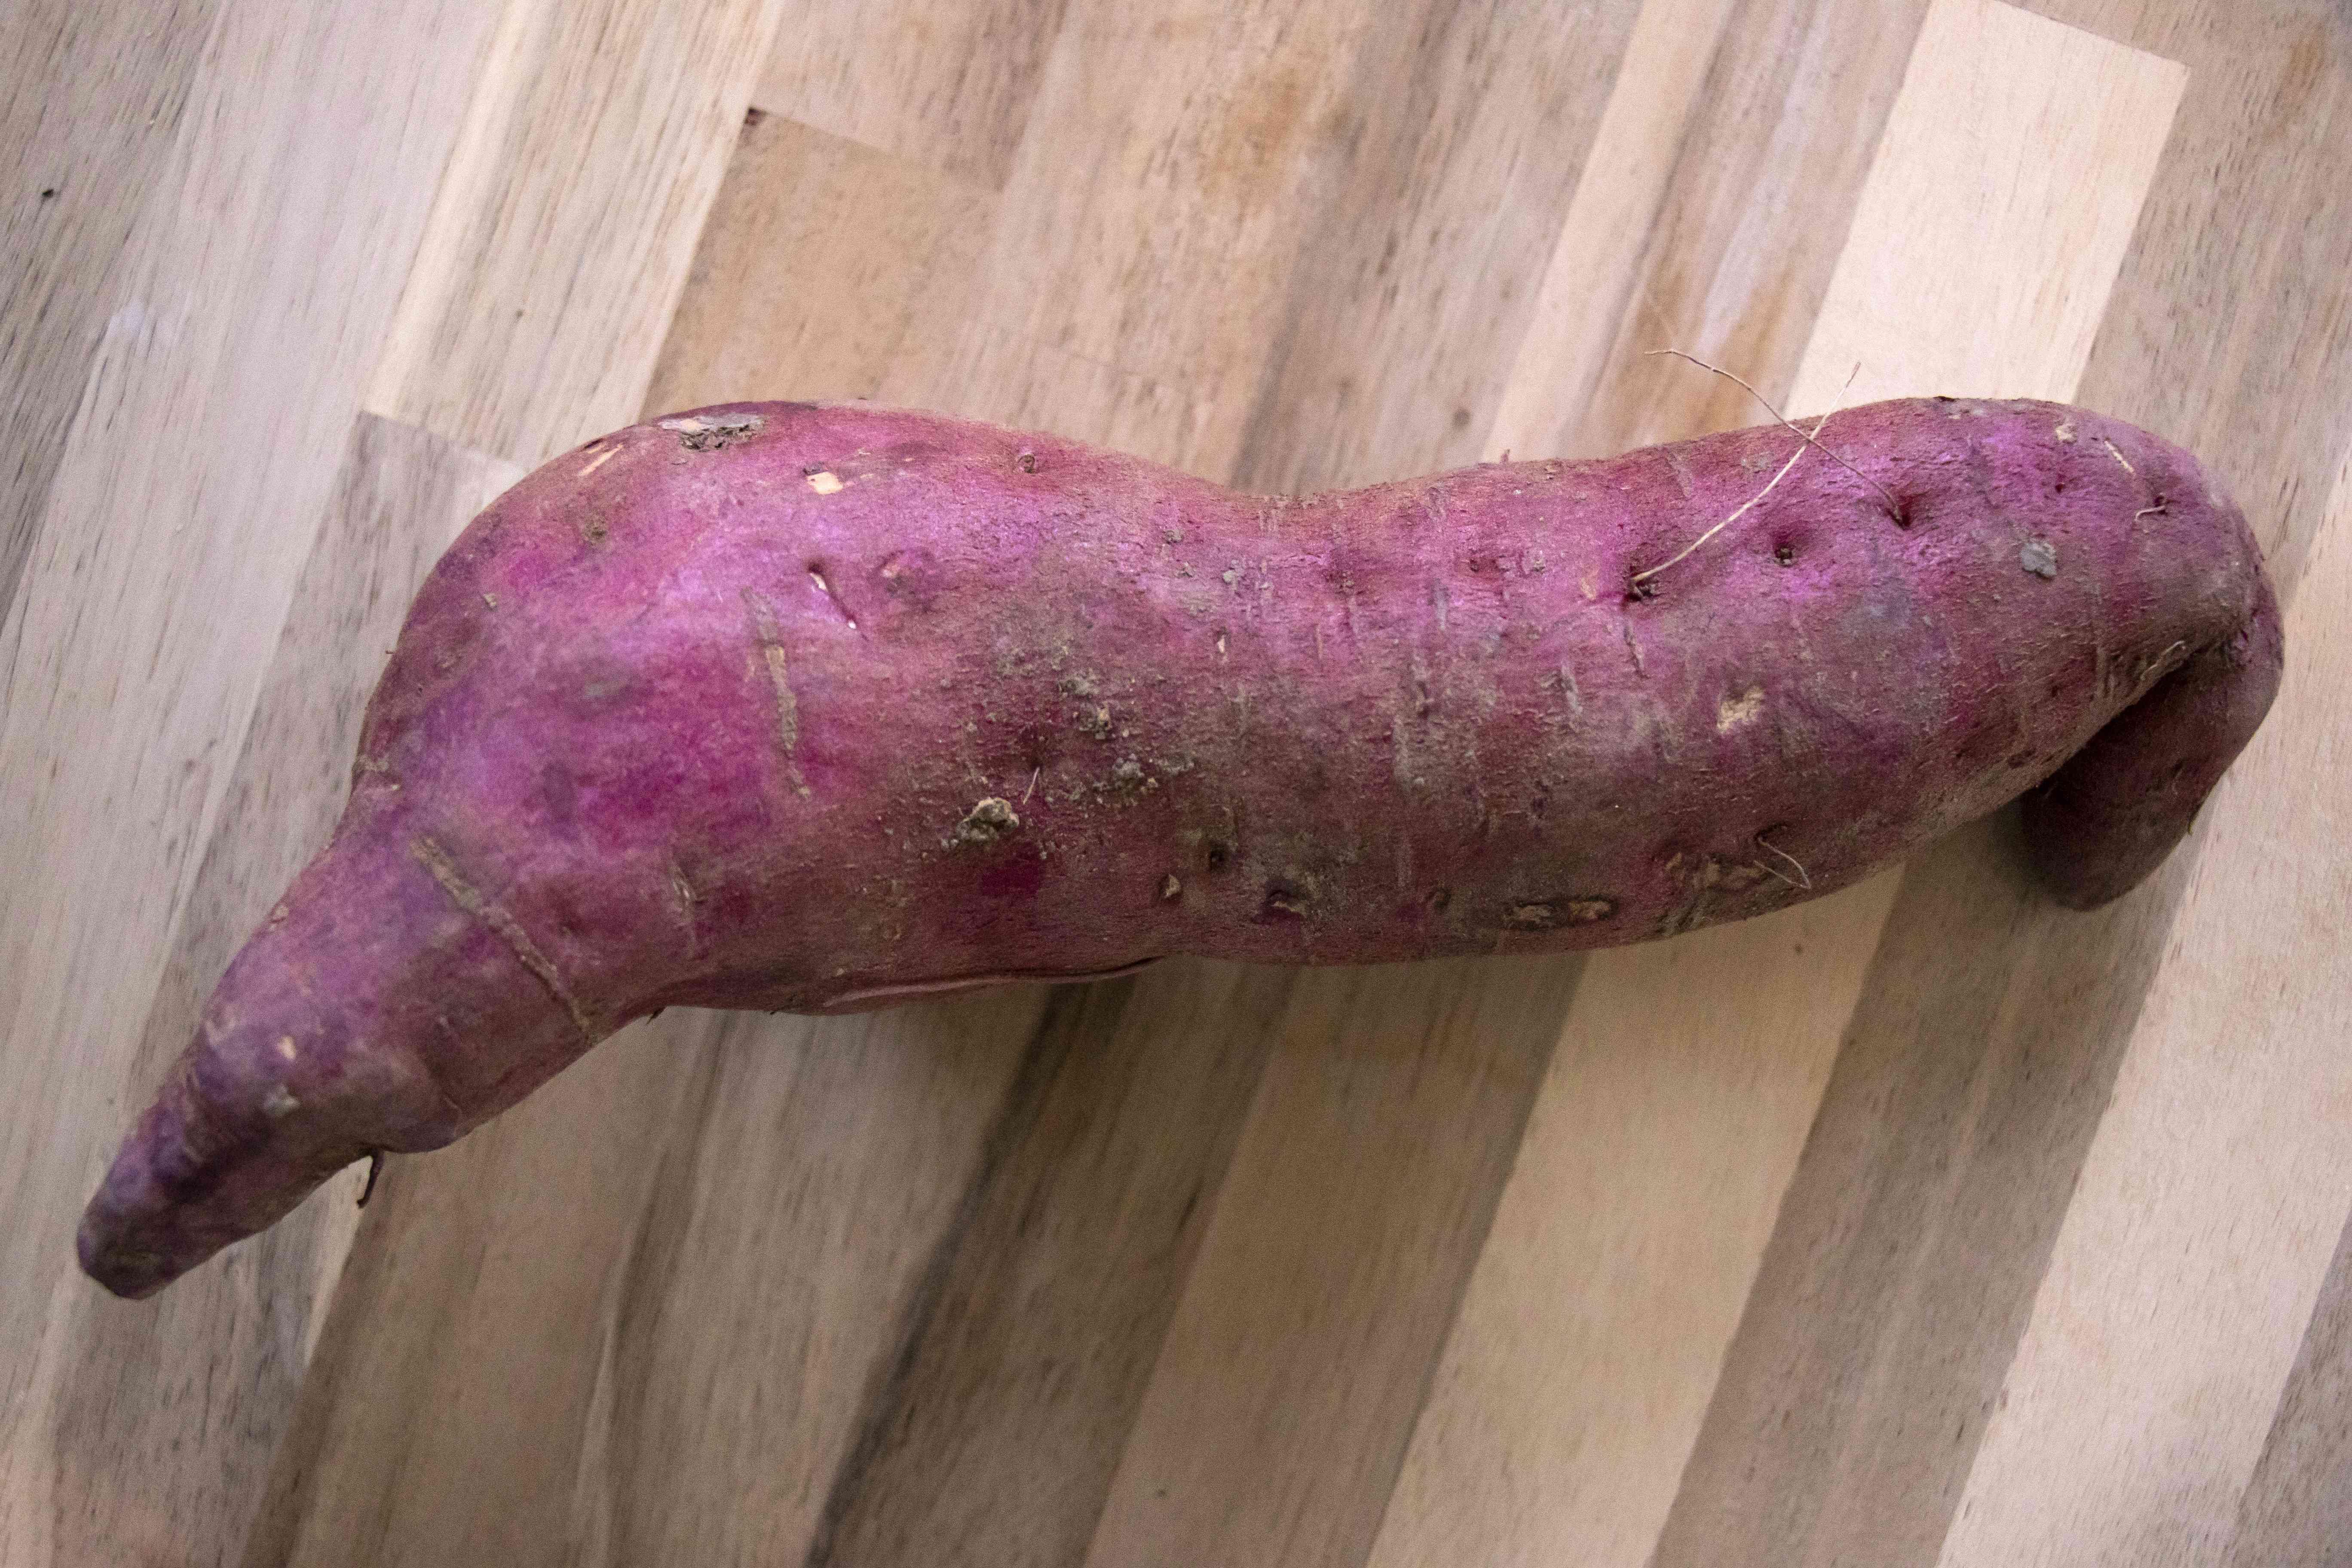 purple sweet potato on wood